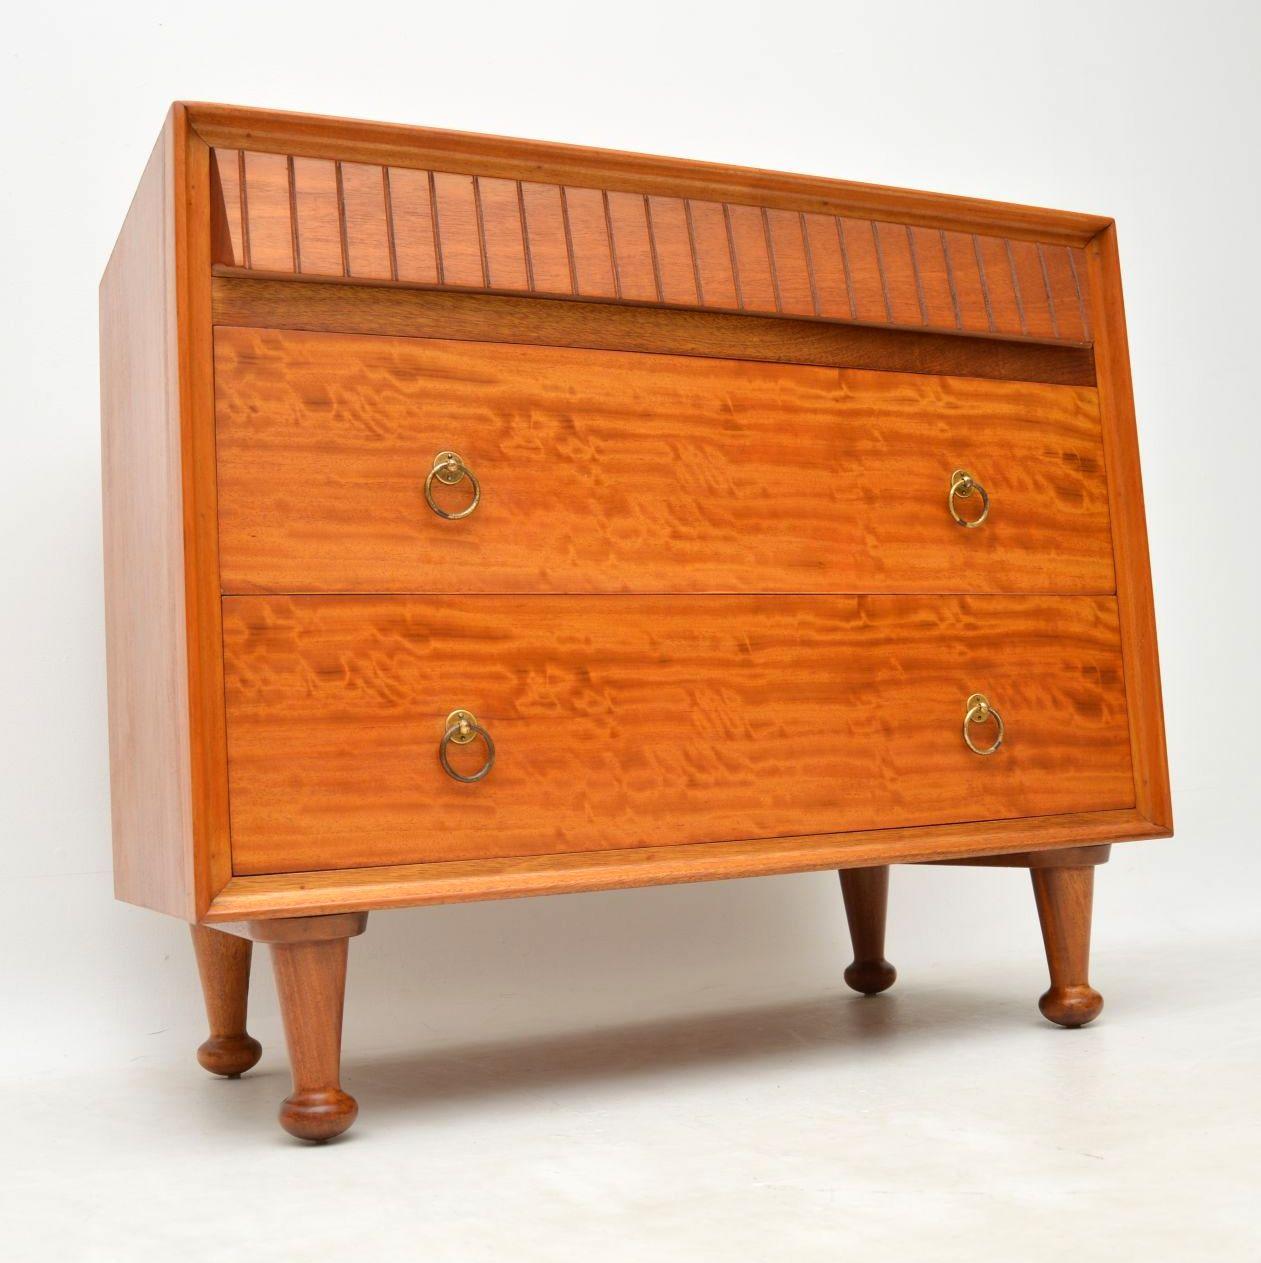 retro_vintage_satinwood_heals_chest_of_drawers_1